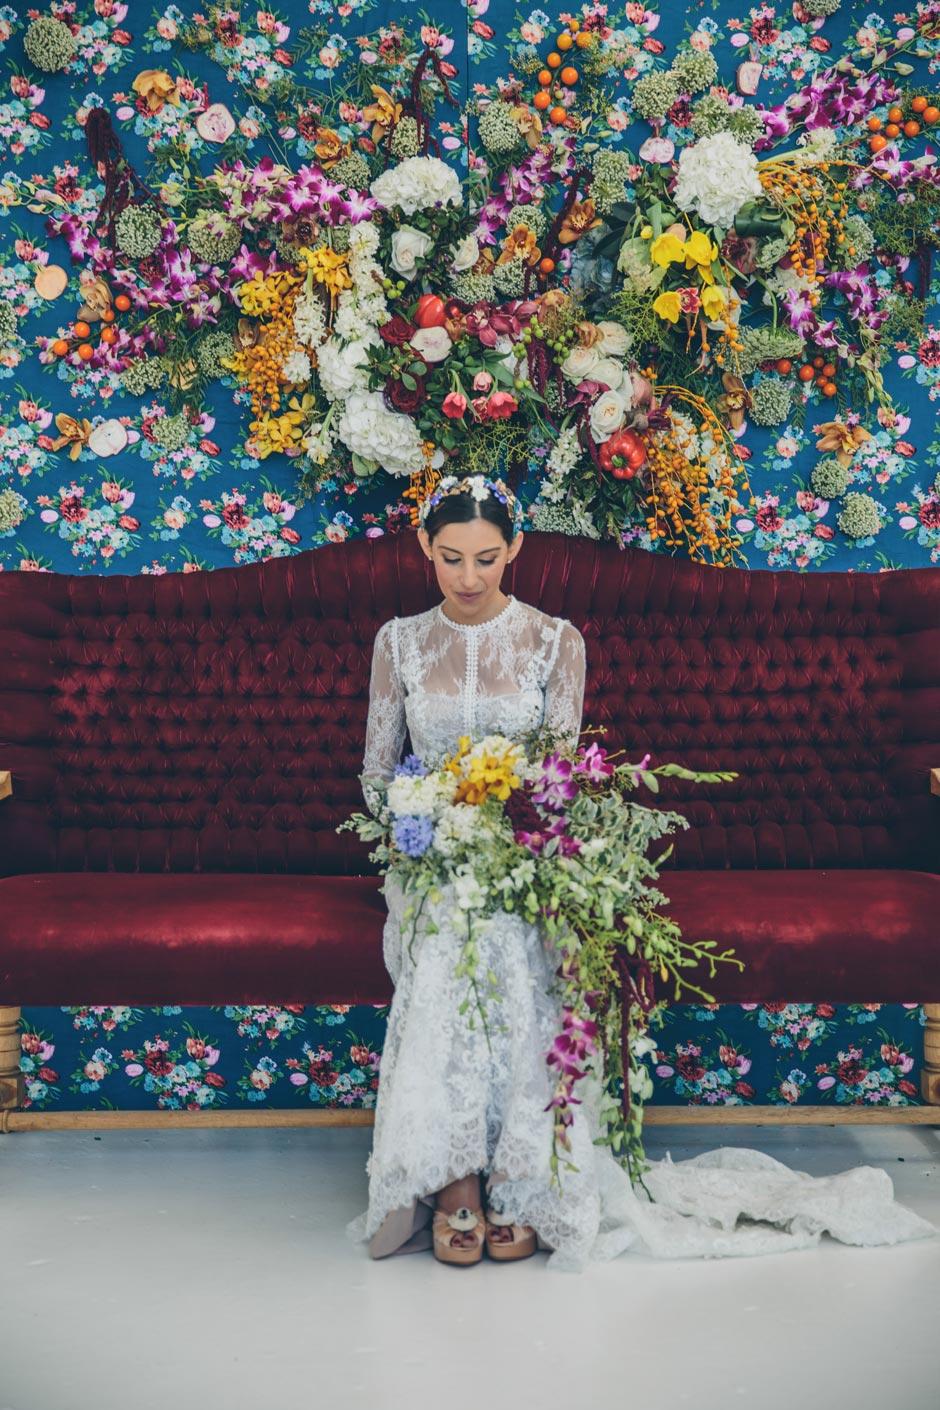 cape-town-wedding-south-africa-east-city-studio-shanna-jones-photography-raphaella-jedd-169